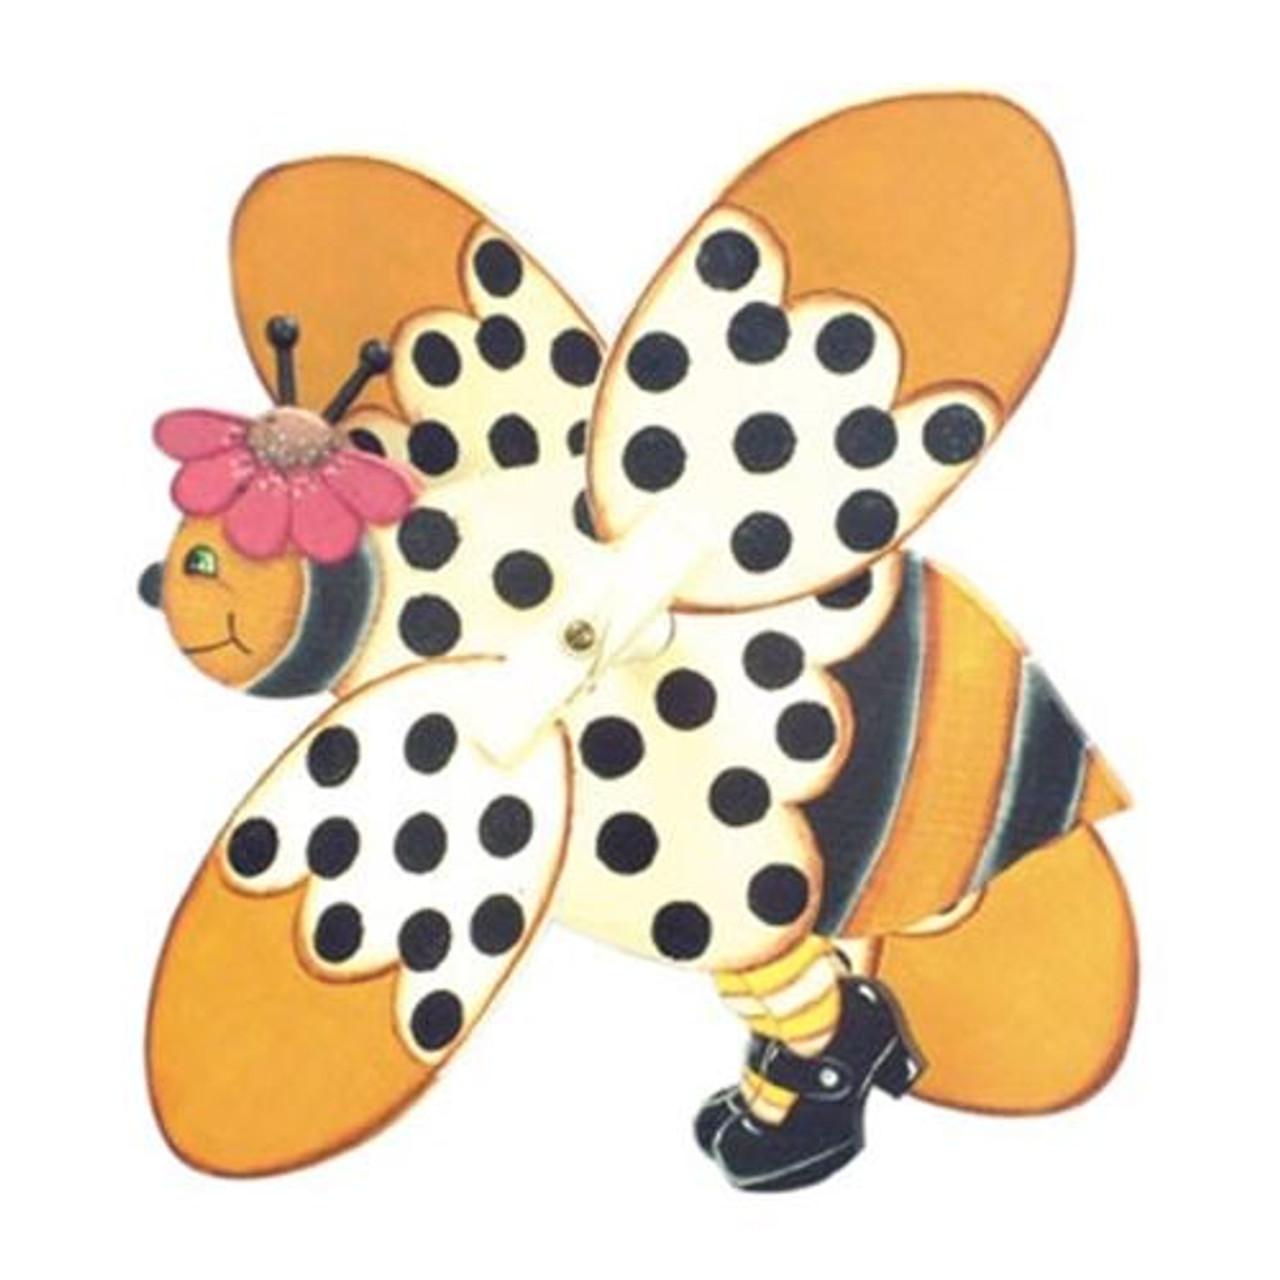 Cherry Tree Toys Bee Whirligig DIY Kit